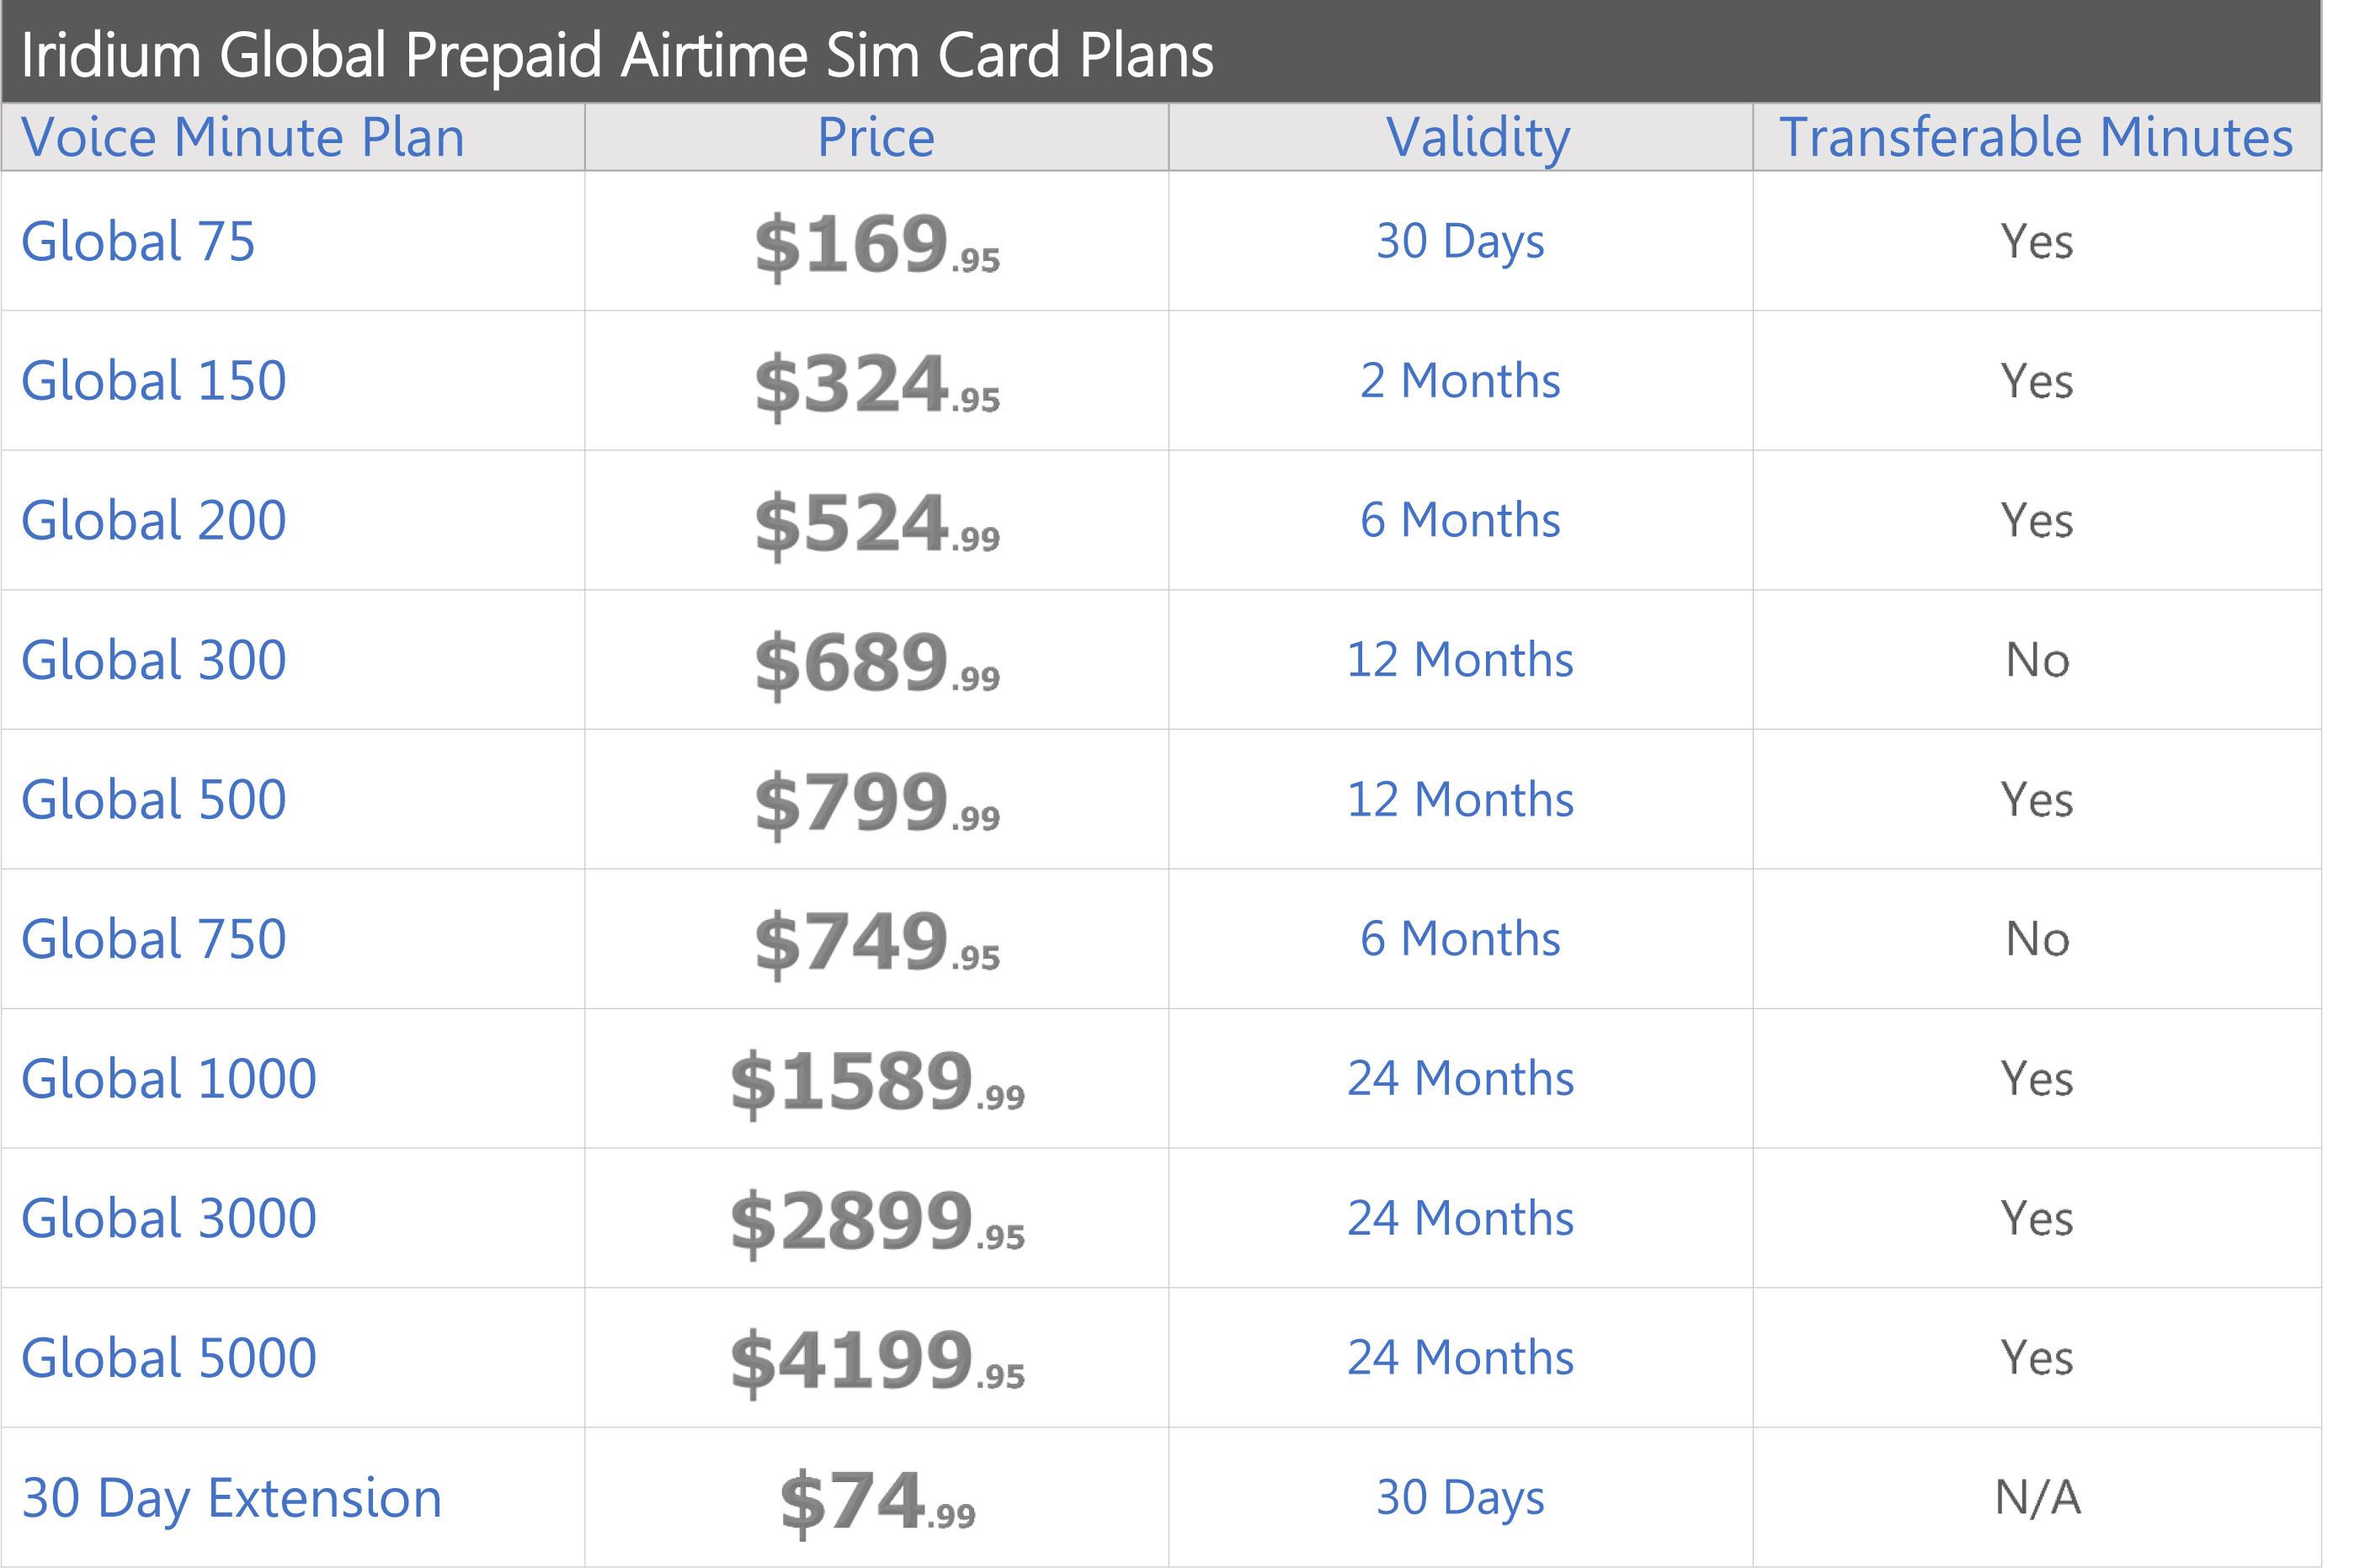 iridium-prepaid-global-airtime-service-plans-price-chart-northernaxcess-2018.jpg